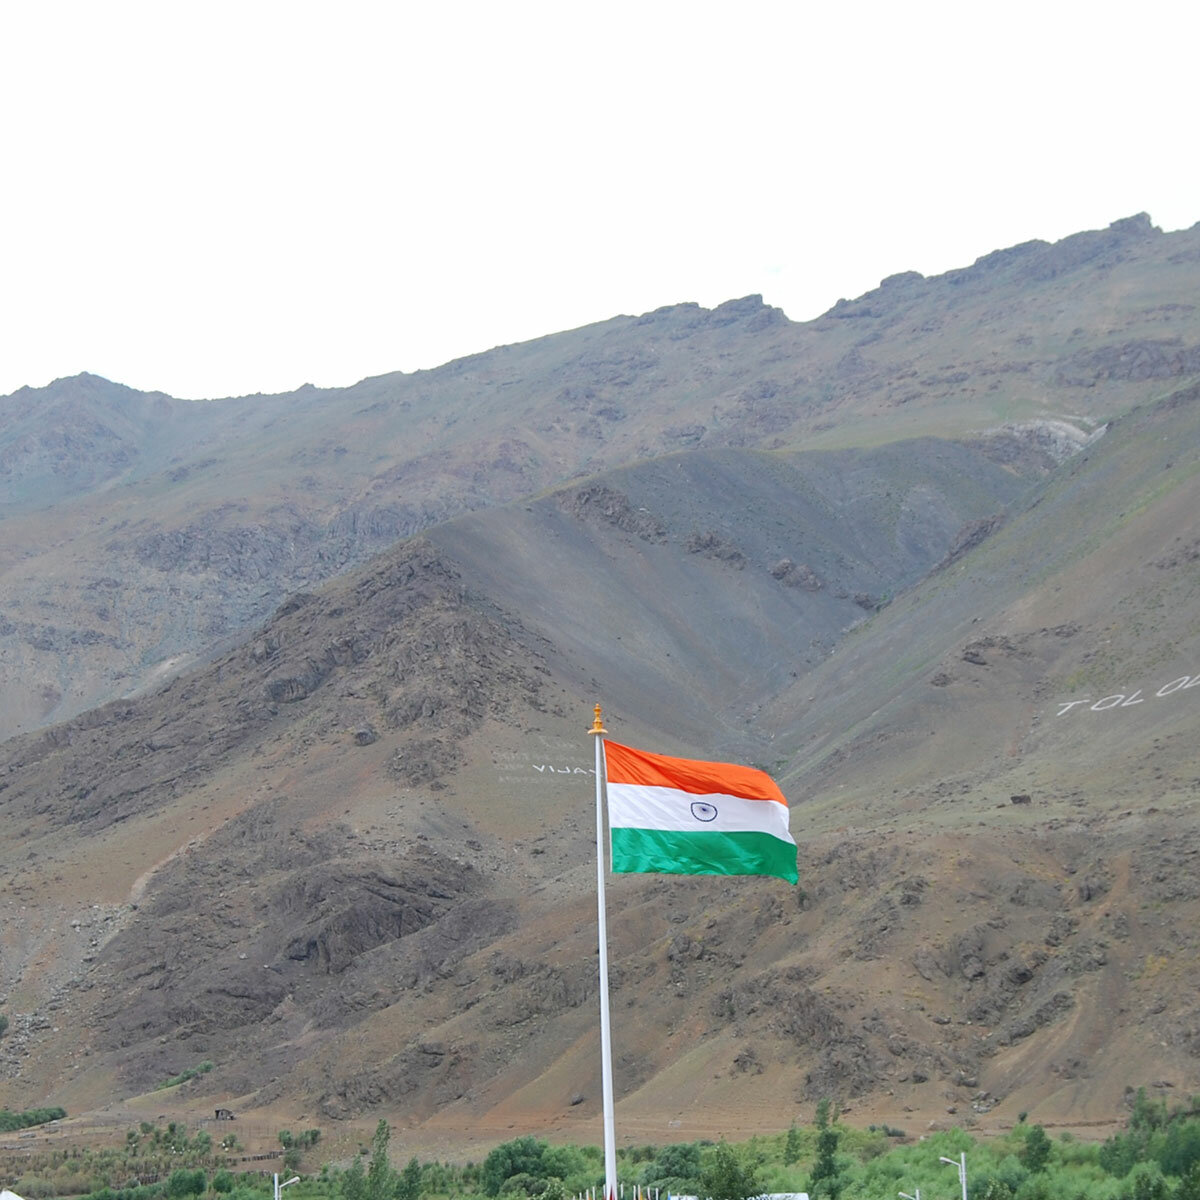 Giant Indian Monumental Flag of 20ft x 30ft at Kargil War Memorial